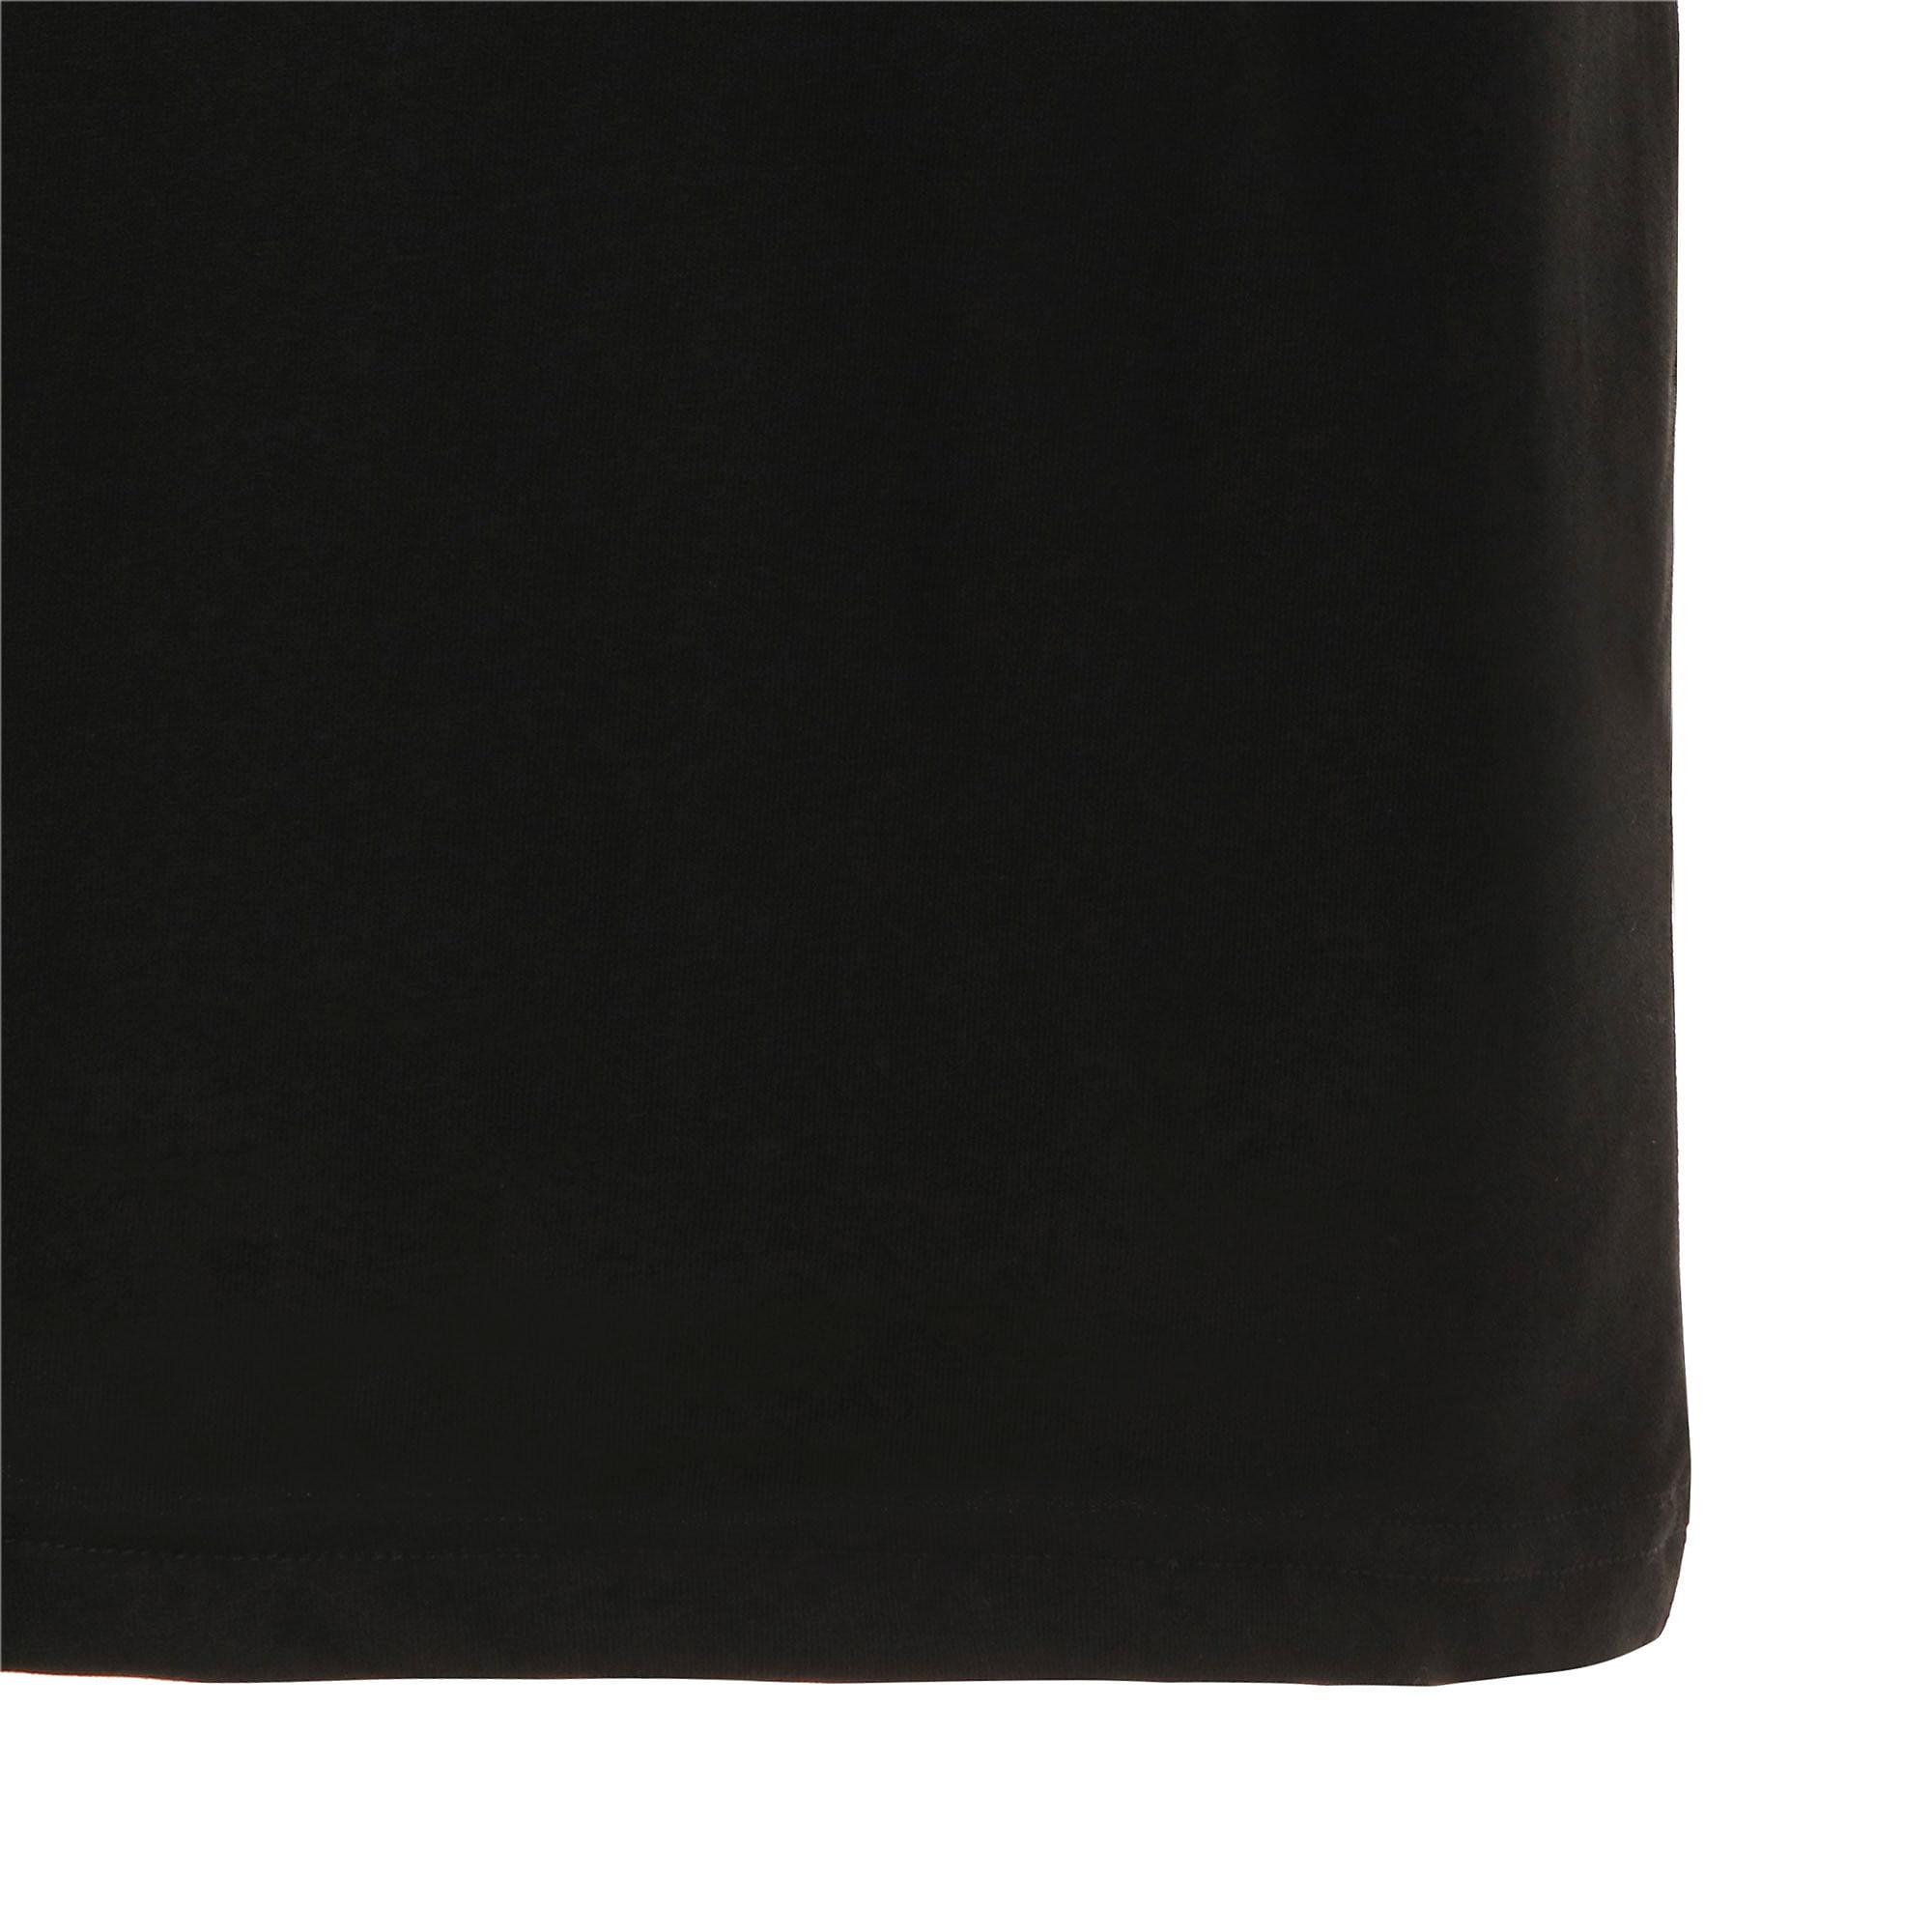 Thumbnail 9 of PUMA XTG グラフィック SS Tシャツ, Puma Black, medium-JPN